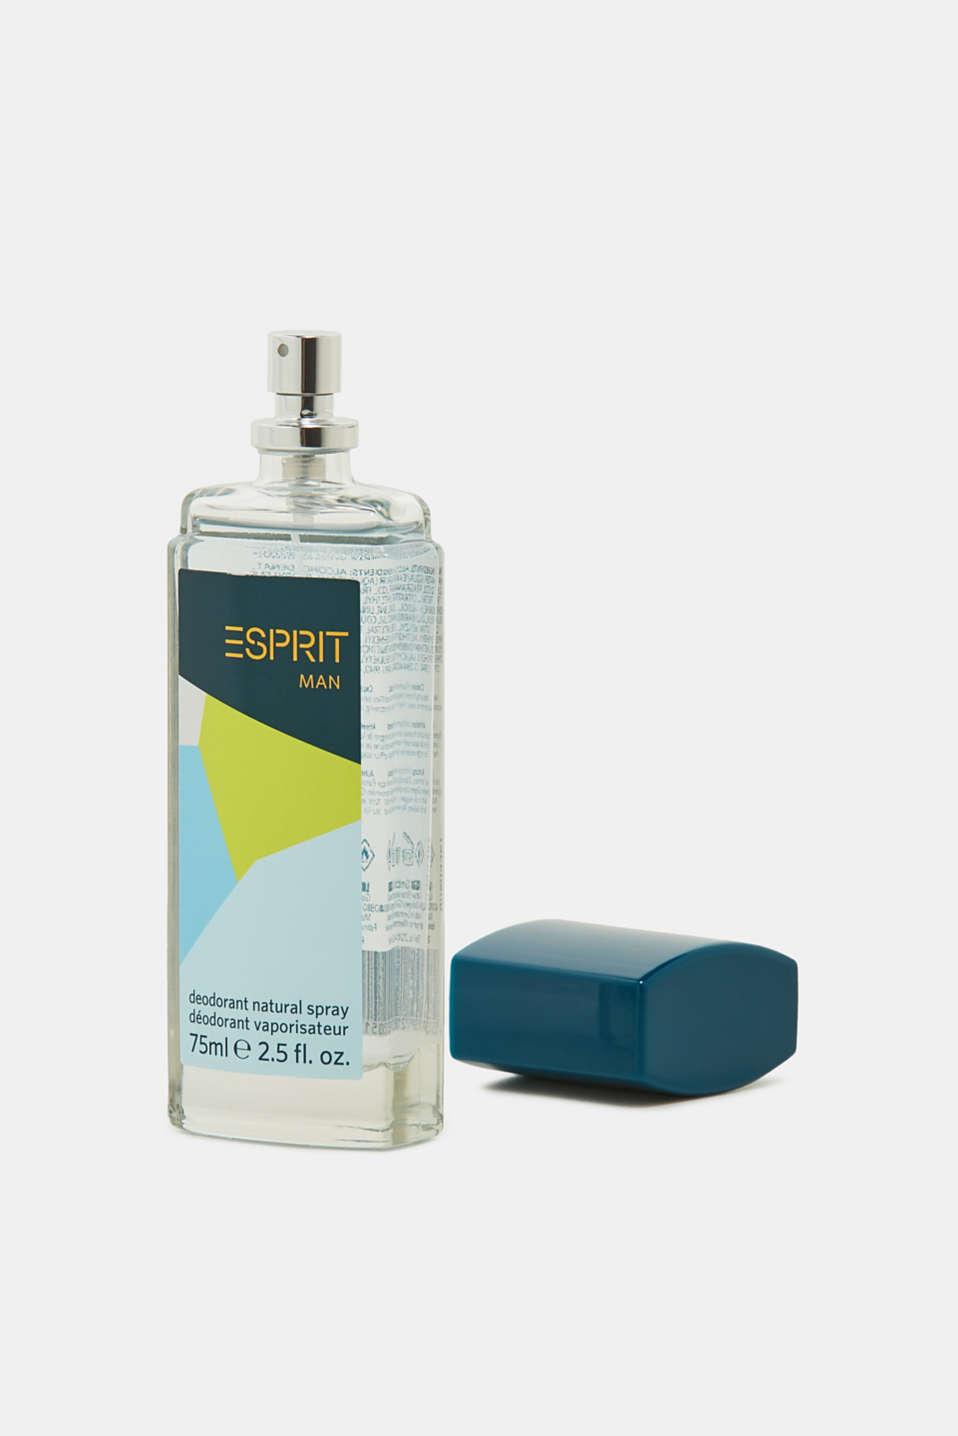 ESPRIT Man deodorant, 75 ml, one colour, detail image number 1